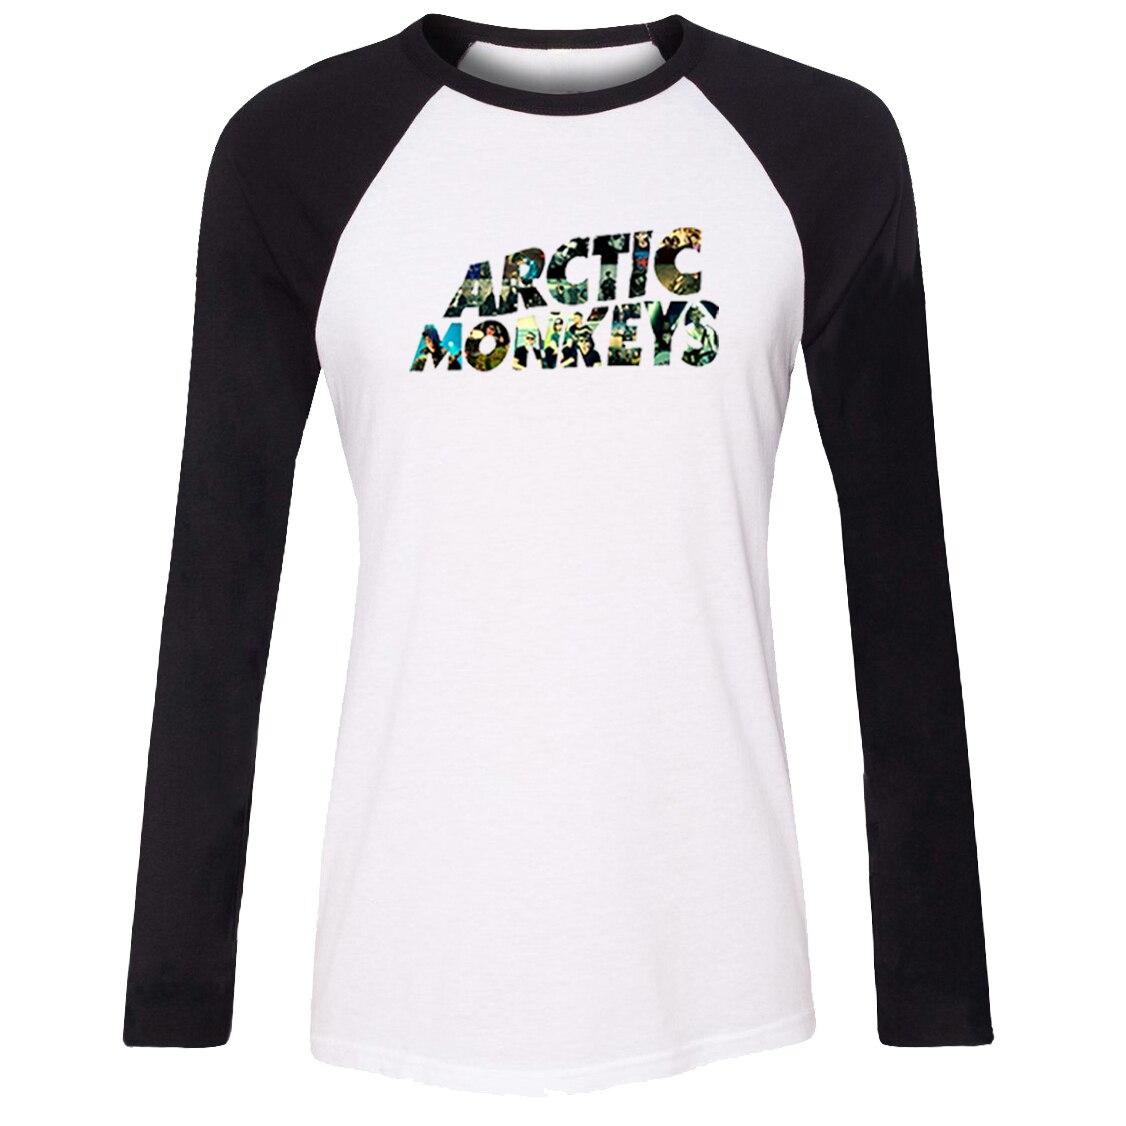 Casusl iDzn Novos das Mulheres Quentes T-shirt Arctic Monkeys Onda Sonora Rock banda Padrão Raglan Manga Longa camiseta da Menina Senhora Camisetas Topos